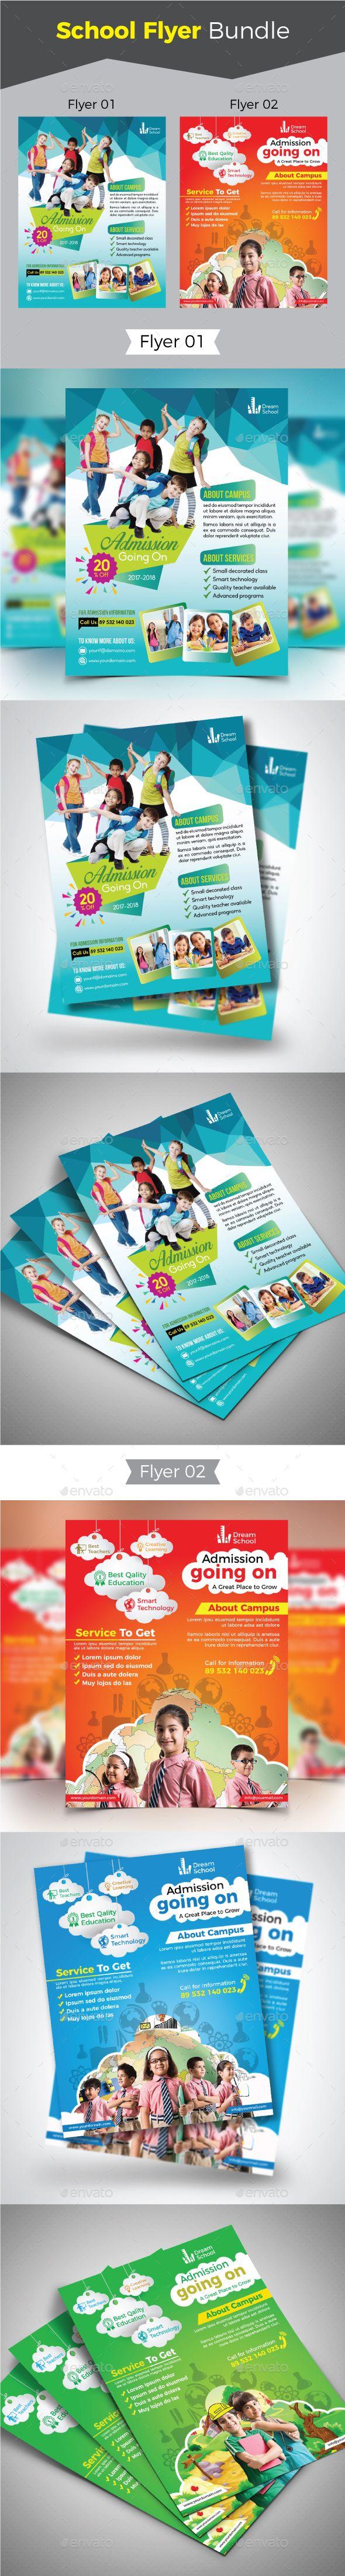 School Flyer Template Bundle - Vector EPS, AI Illustrator | Flyer ...